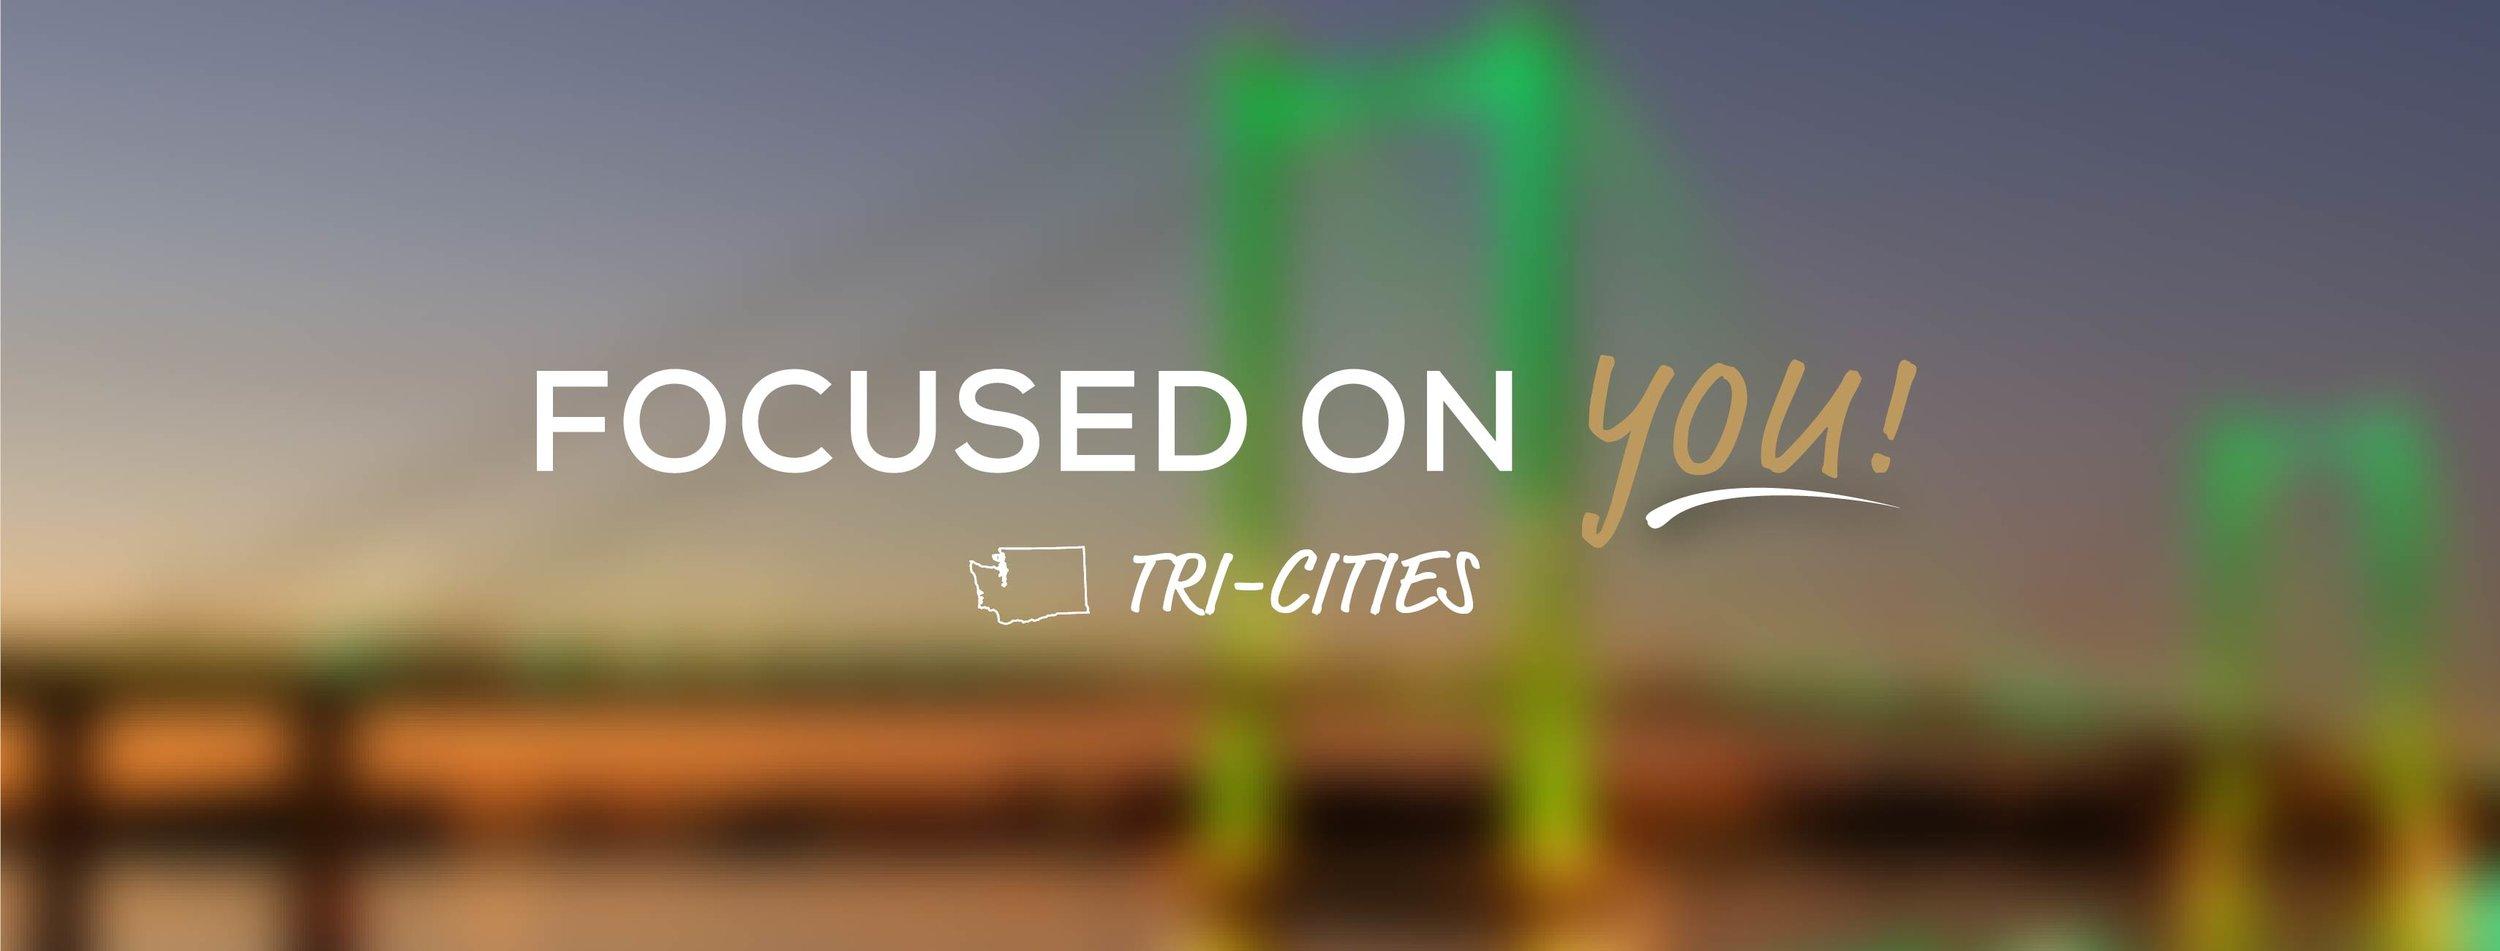 Tri-Cities - 509.380.5828tricities@directorsmortgage.net5804 Rd 90, Suite DPasco, WA 99301